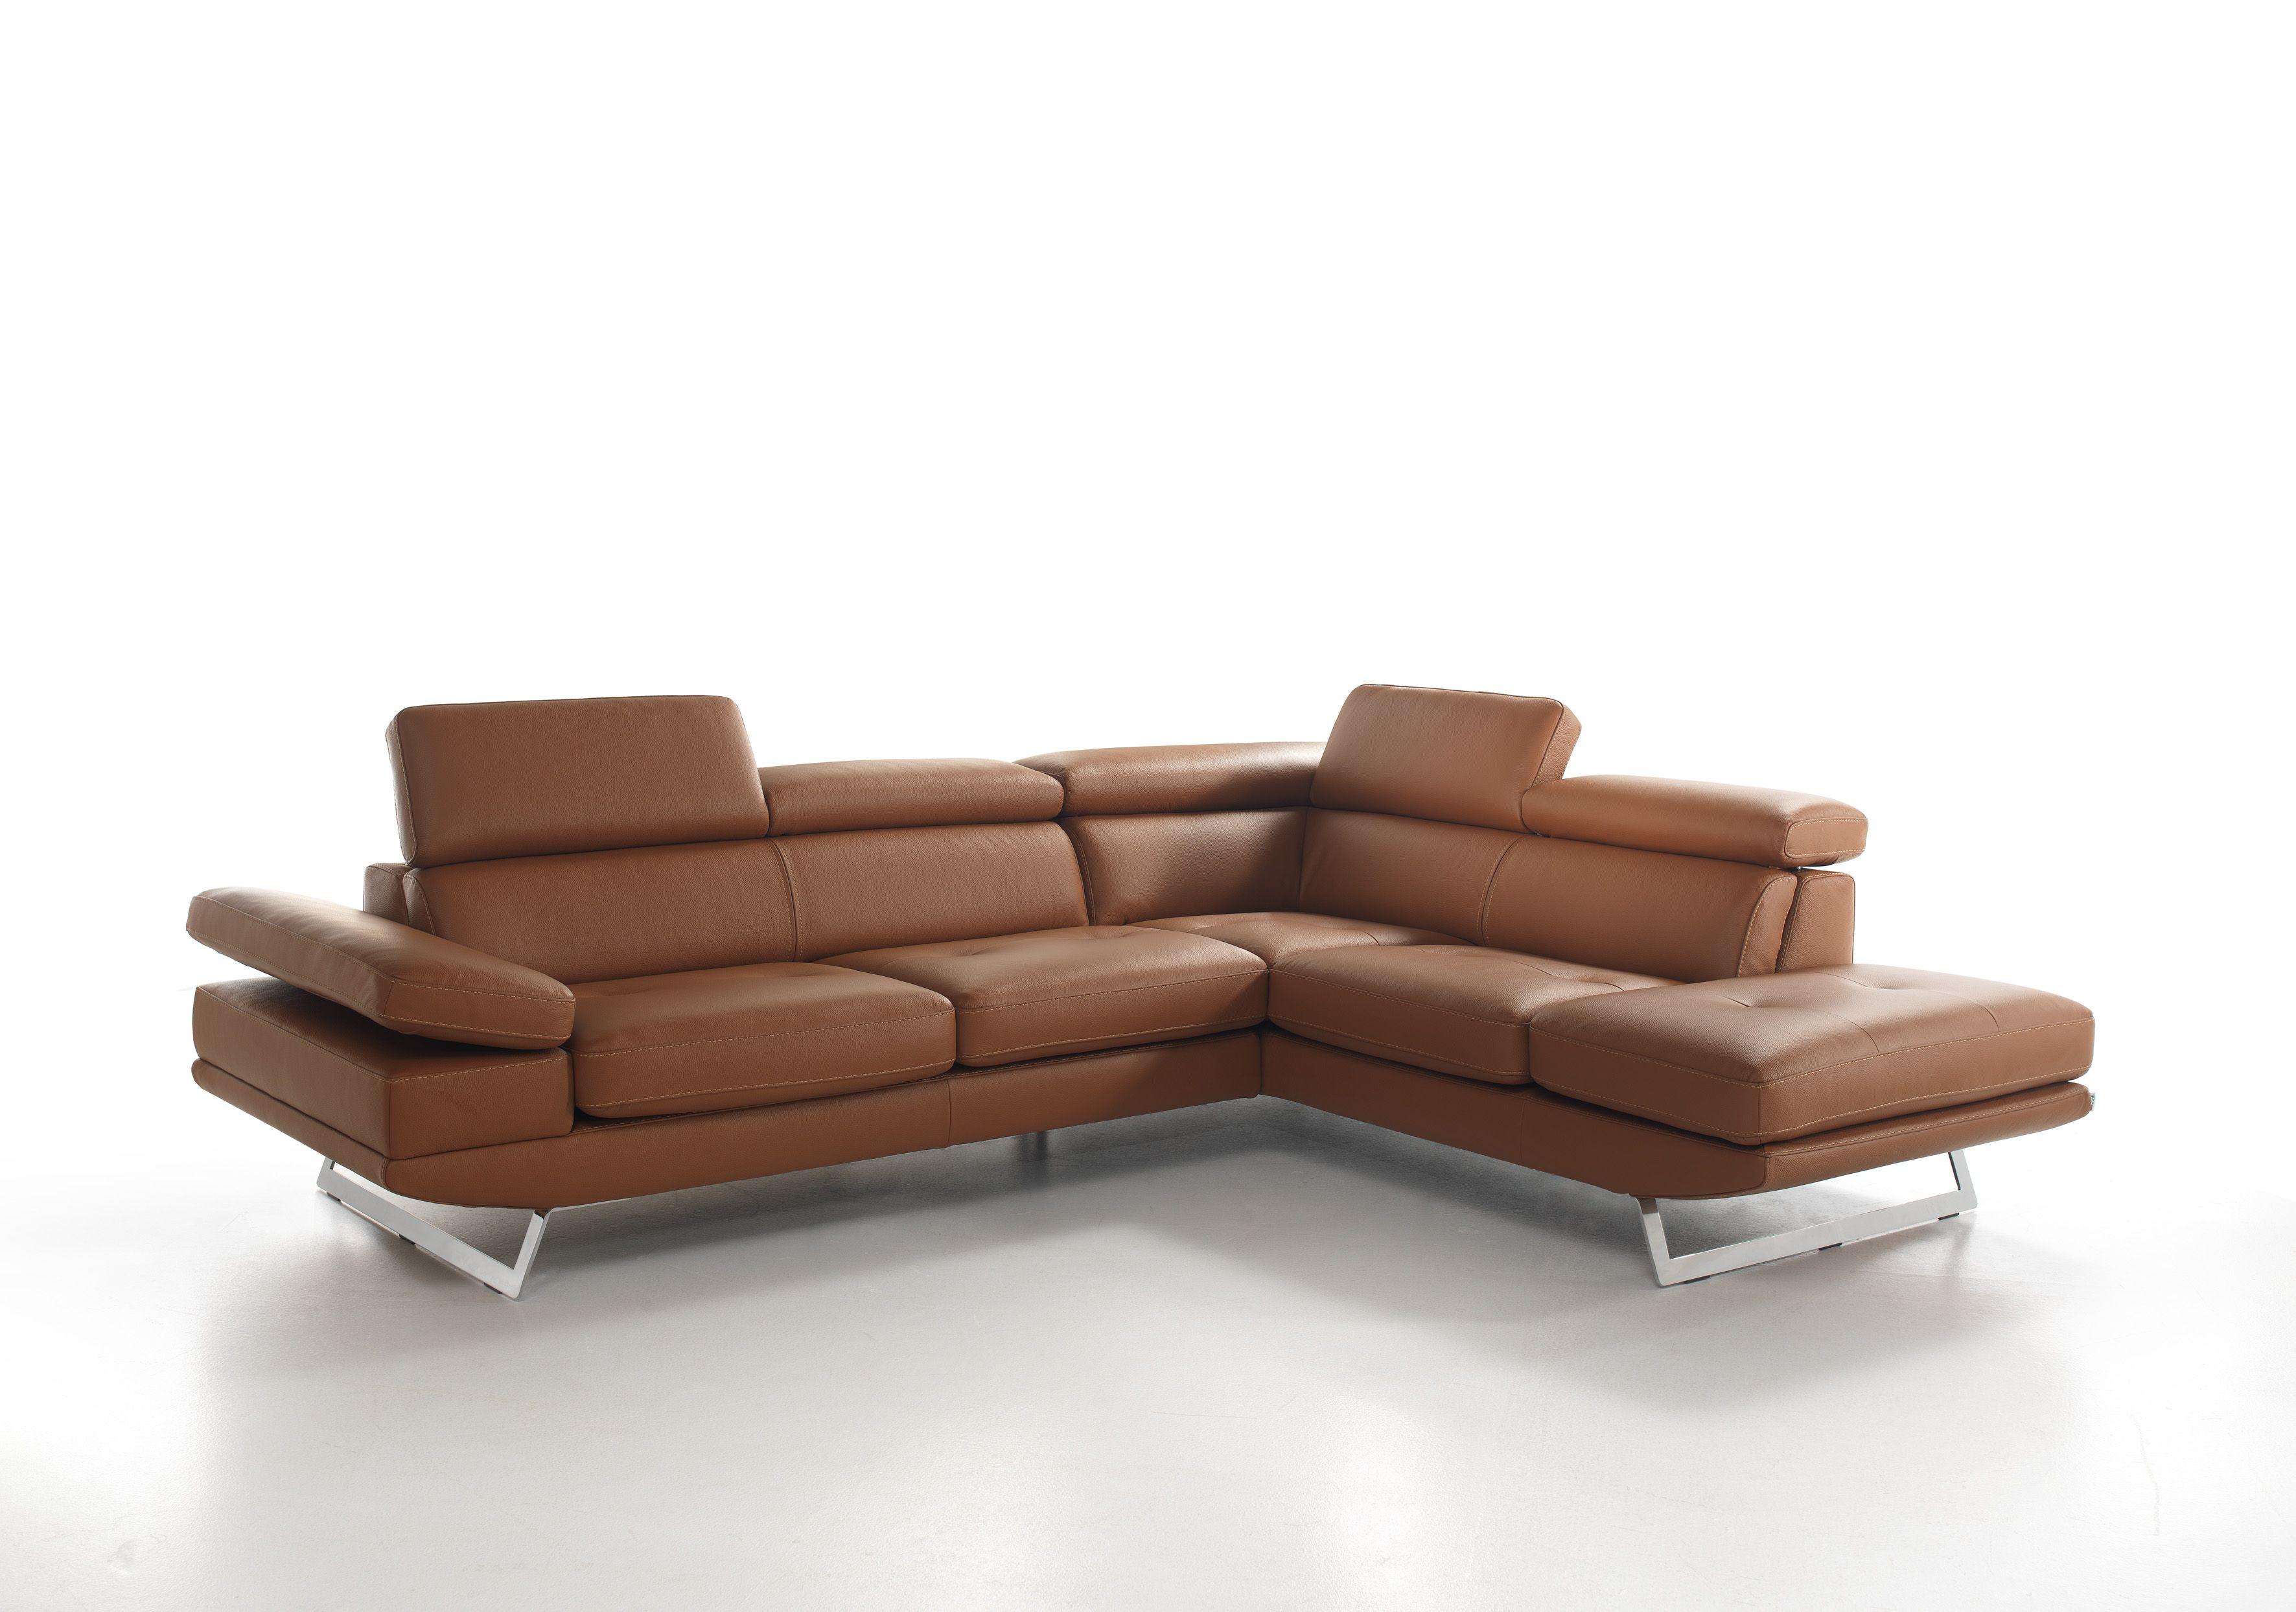 Cappello Mobili ~ Prachtige bruine hoekzetel in moderne stijl stijlvolle zetels